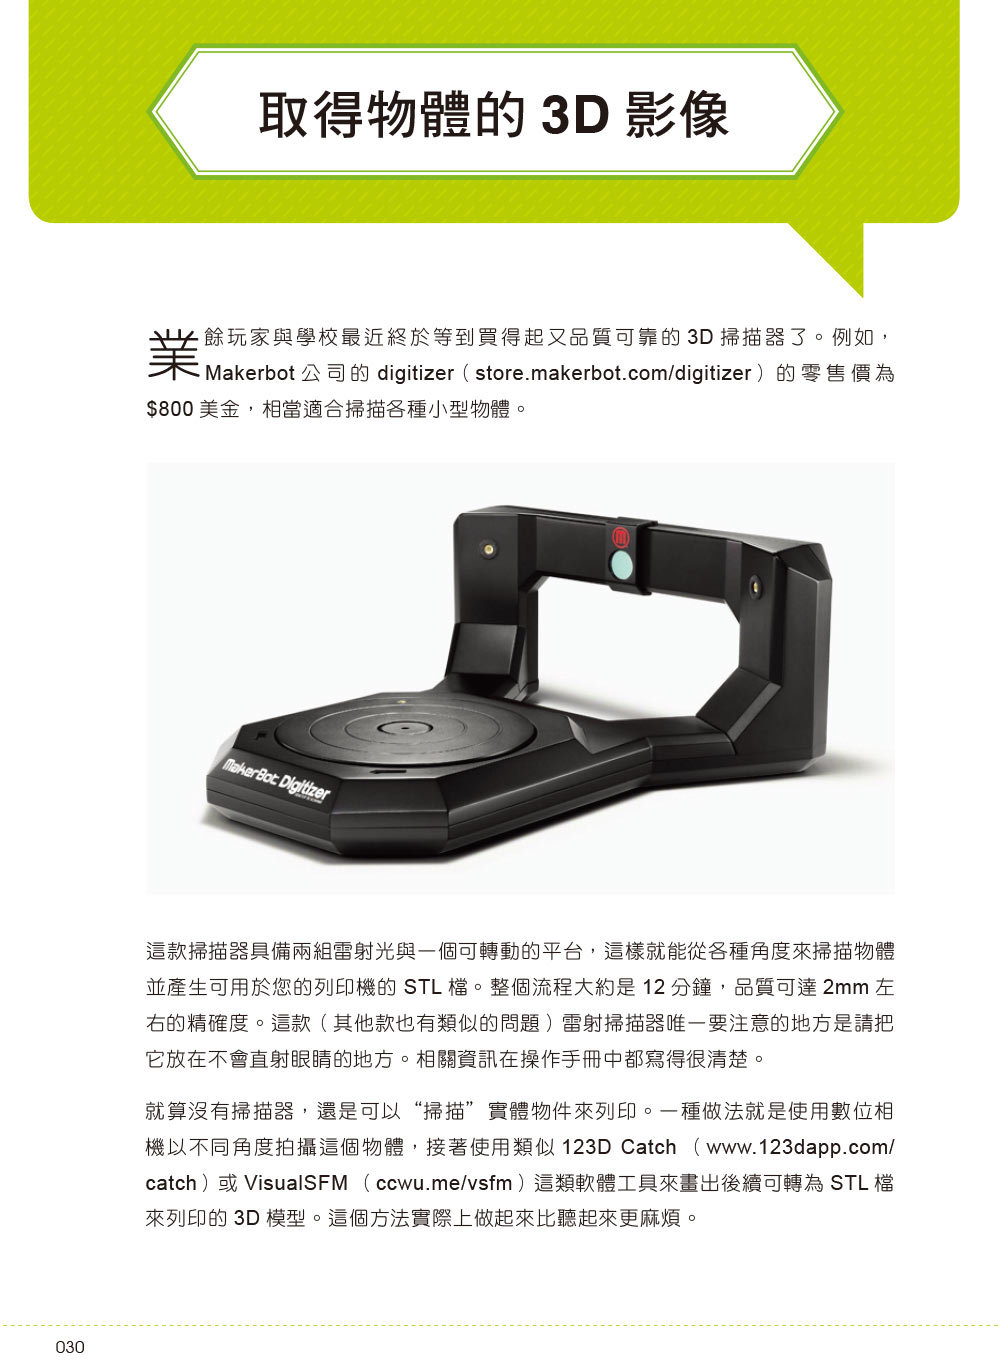 3D列印教室|翻轉教育的成功秘笈-preview-3